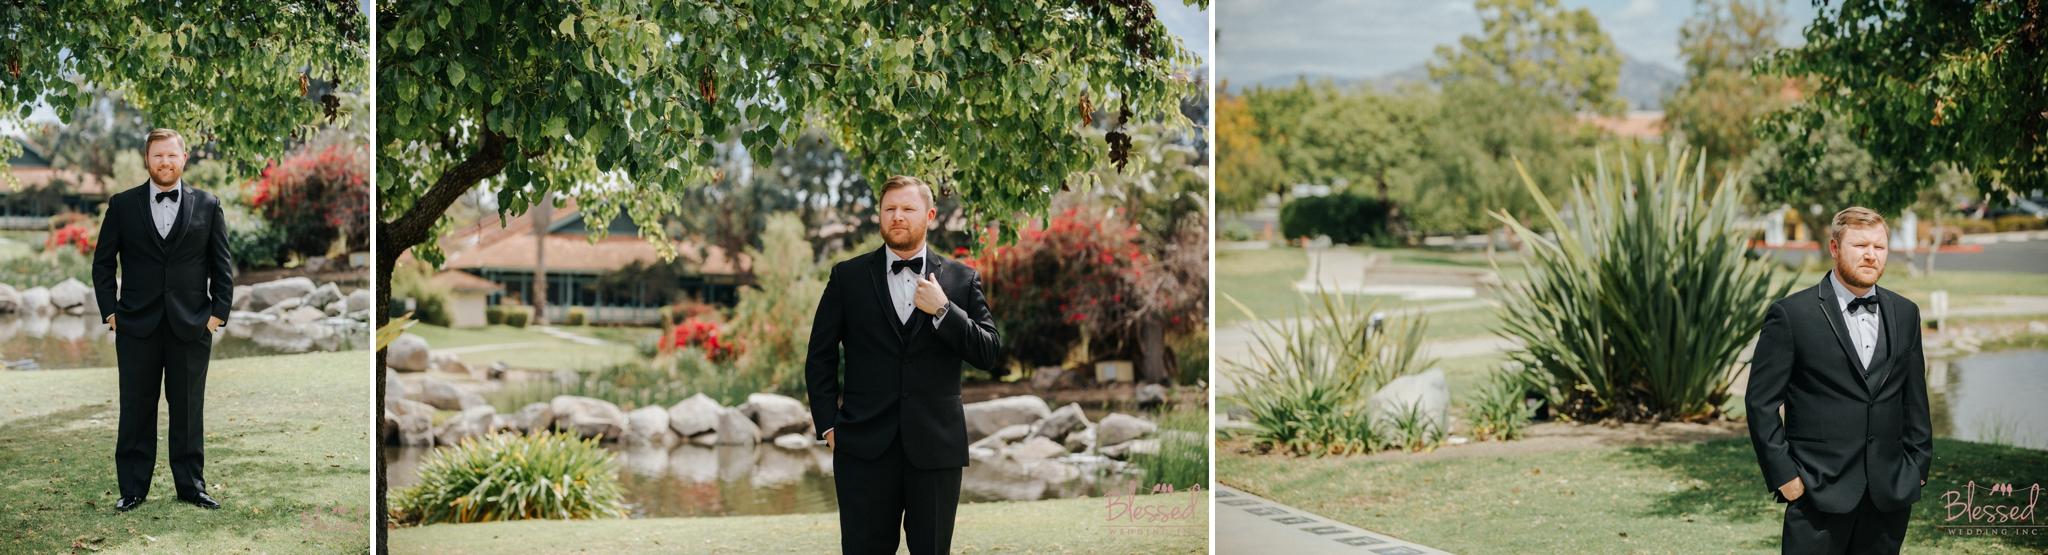 Orfila Vinery Wedding by Blessed Wedding Photography 20.jpg